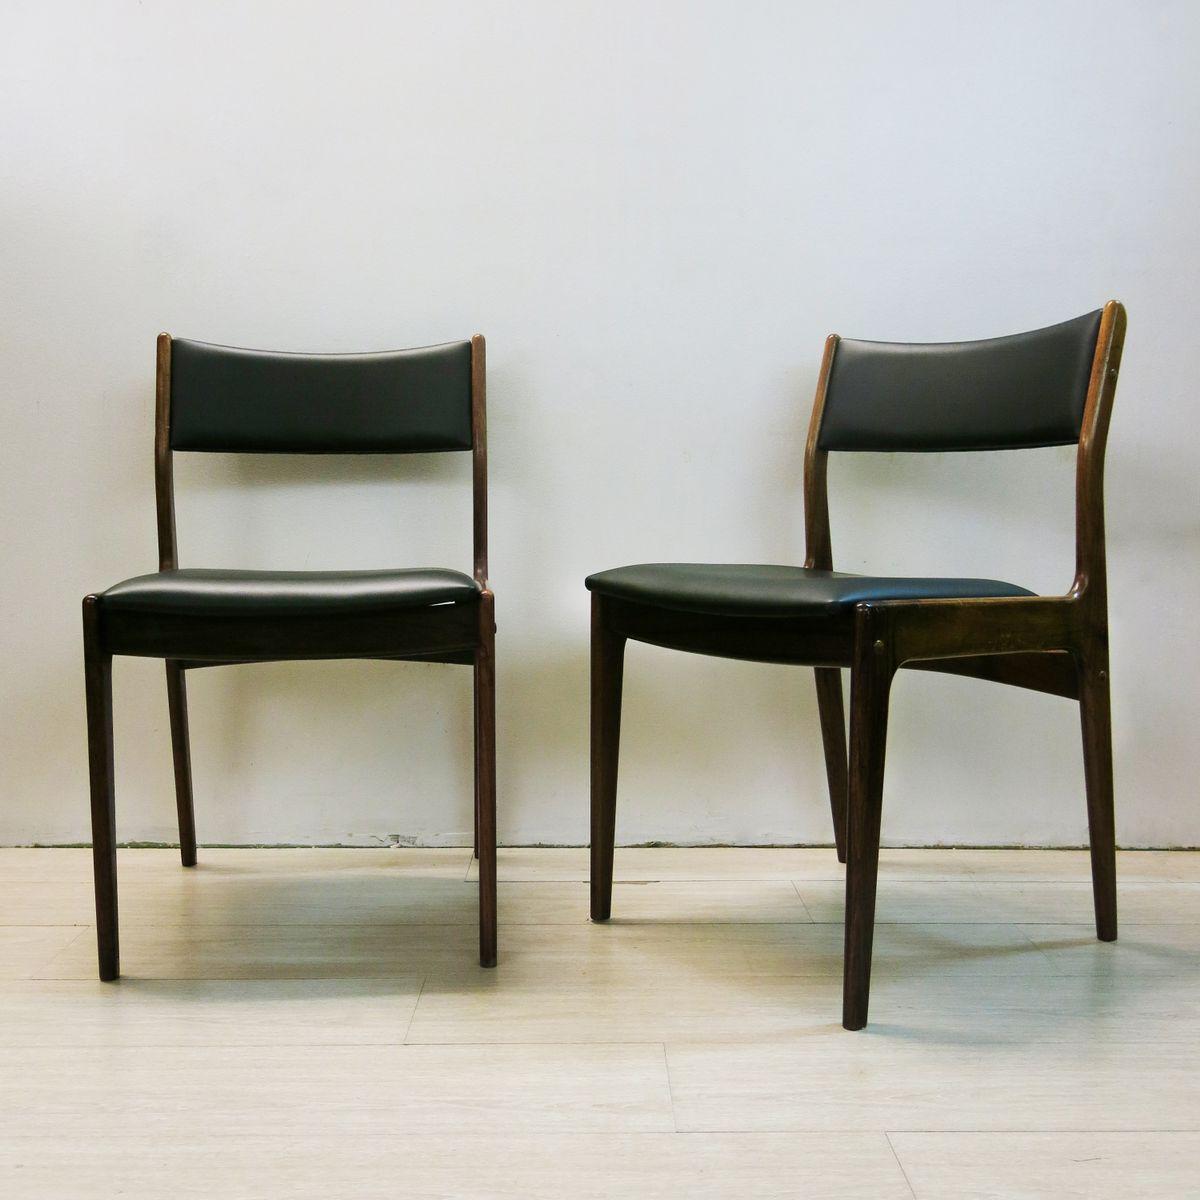 d nische palisander st hle von johannes andersen f r uldum mobelfabrik 1960er 4er set bei. Black Bedroom Furniture Sets. Home Design Ideas